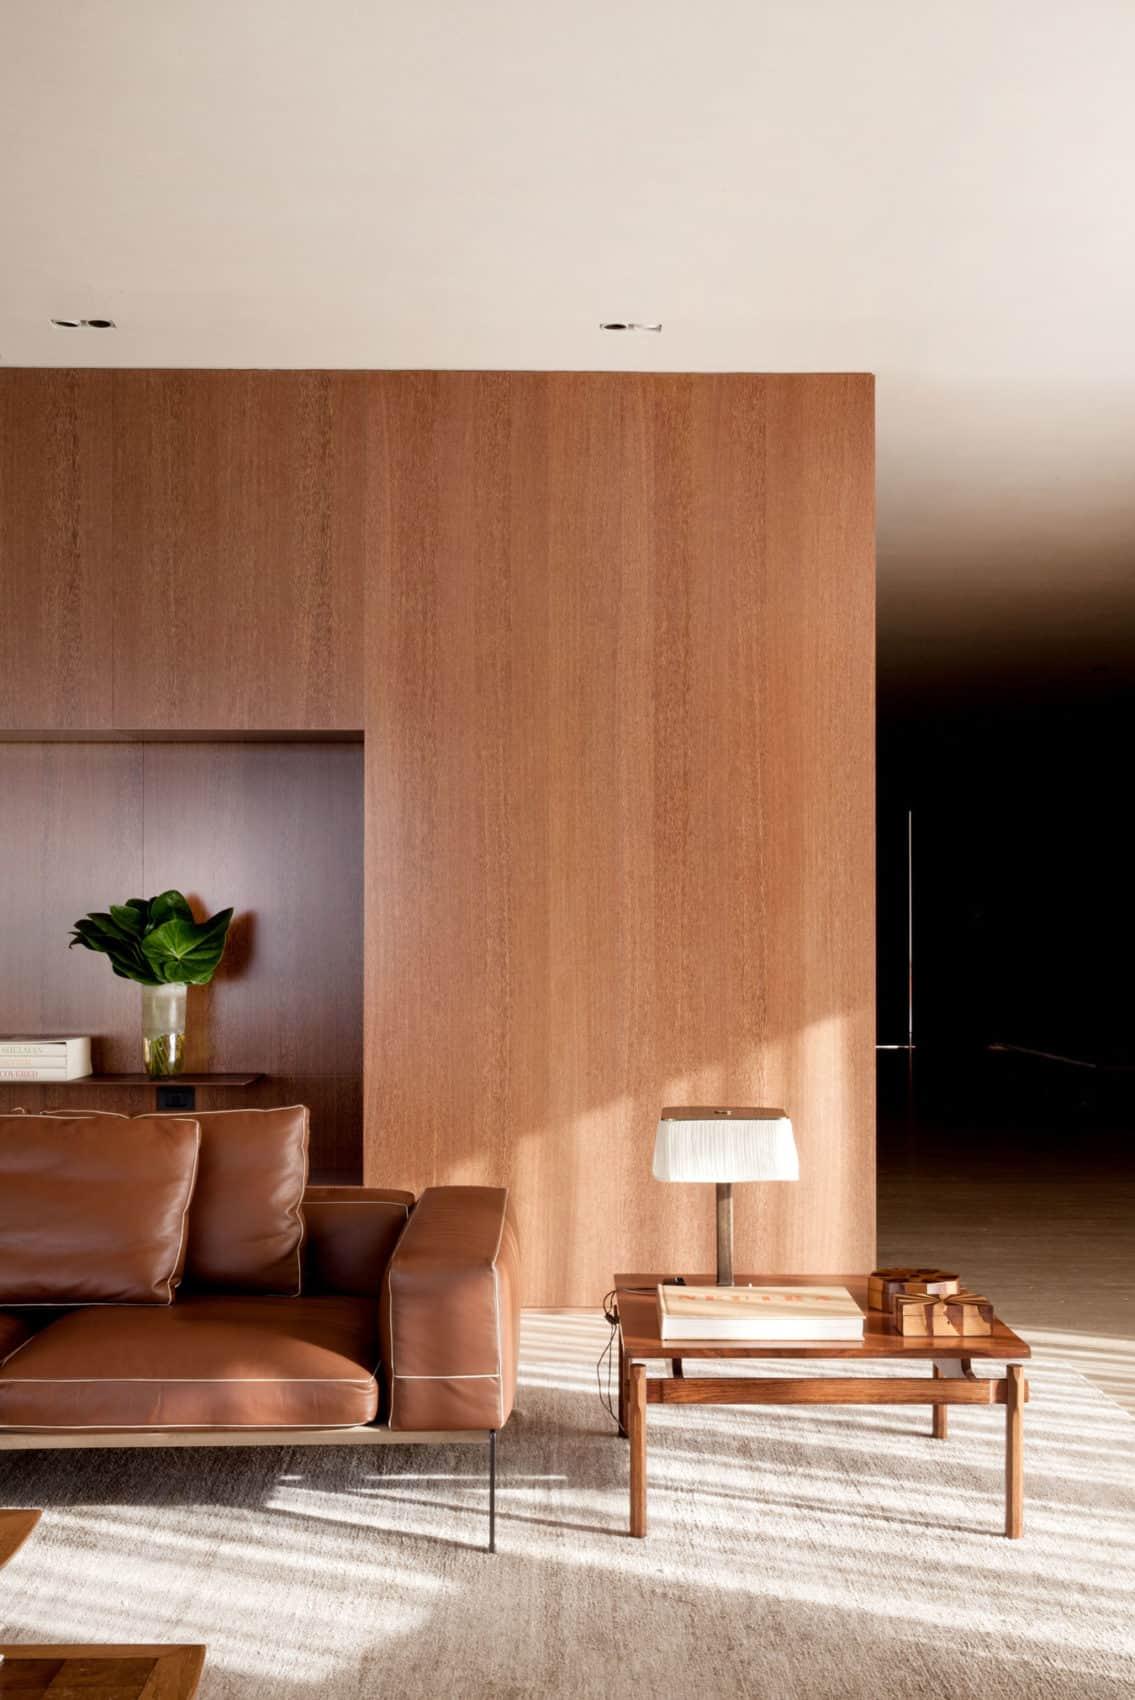 SP Penthouse by Studio MK27 (2)